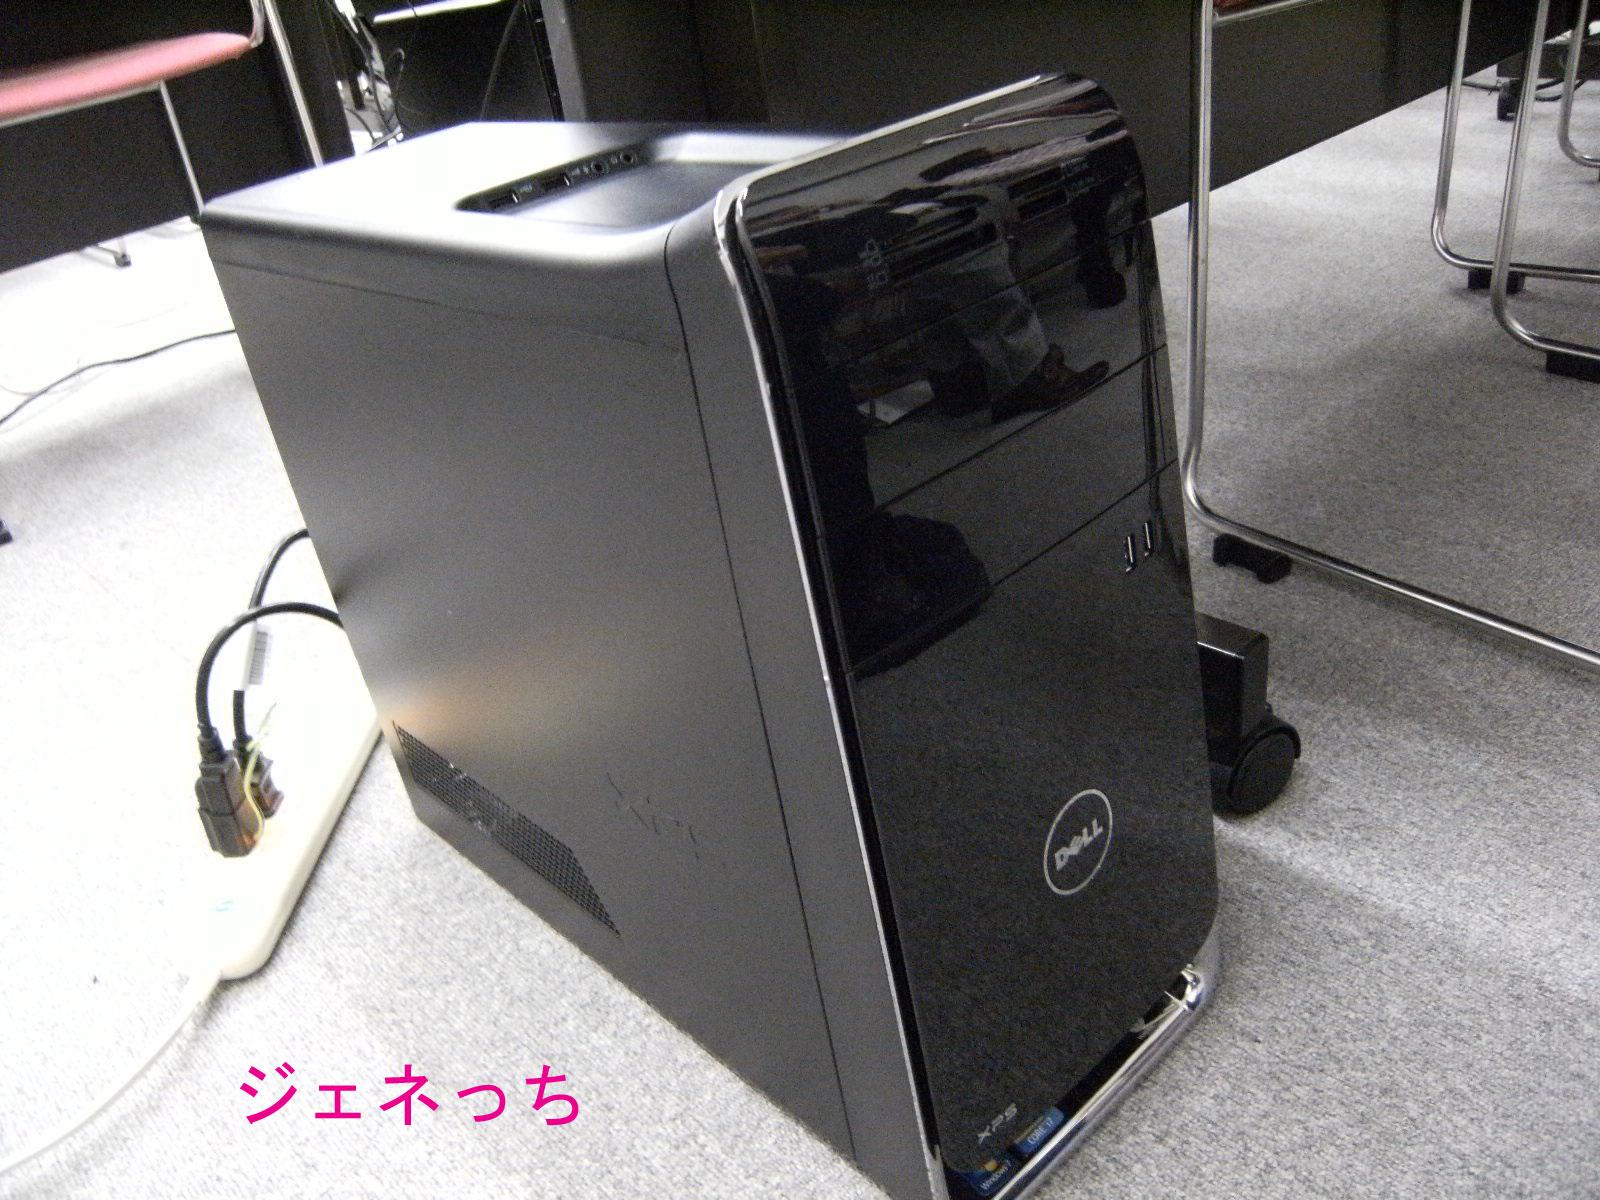 XPS-8500